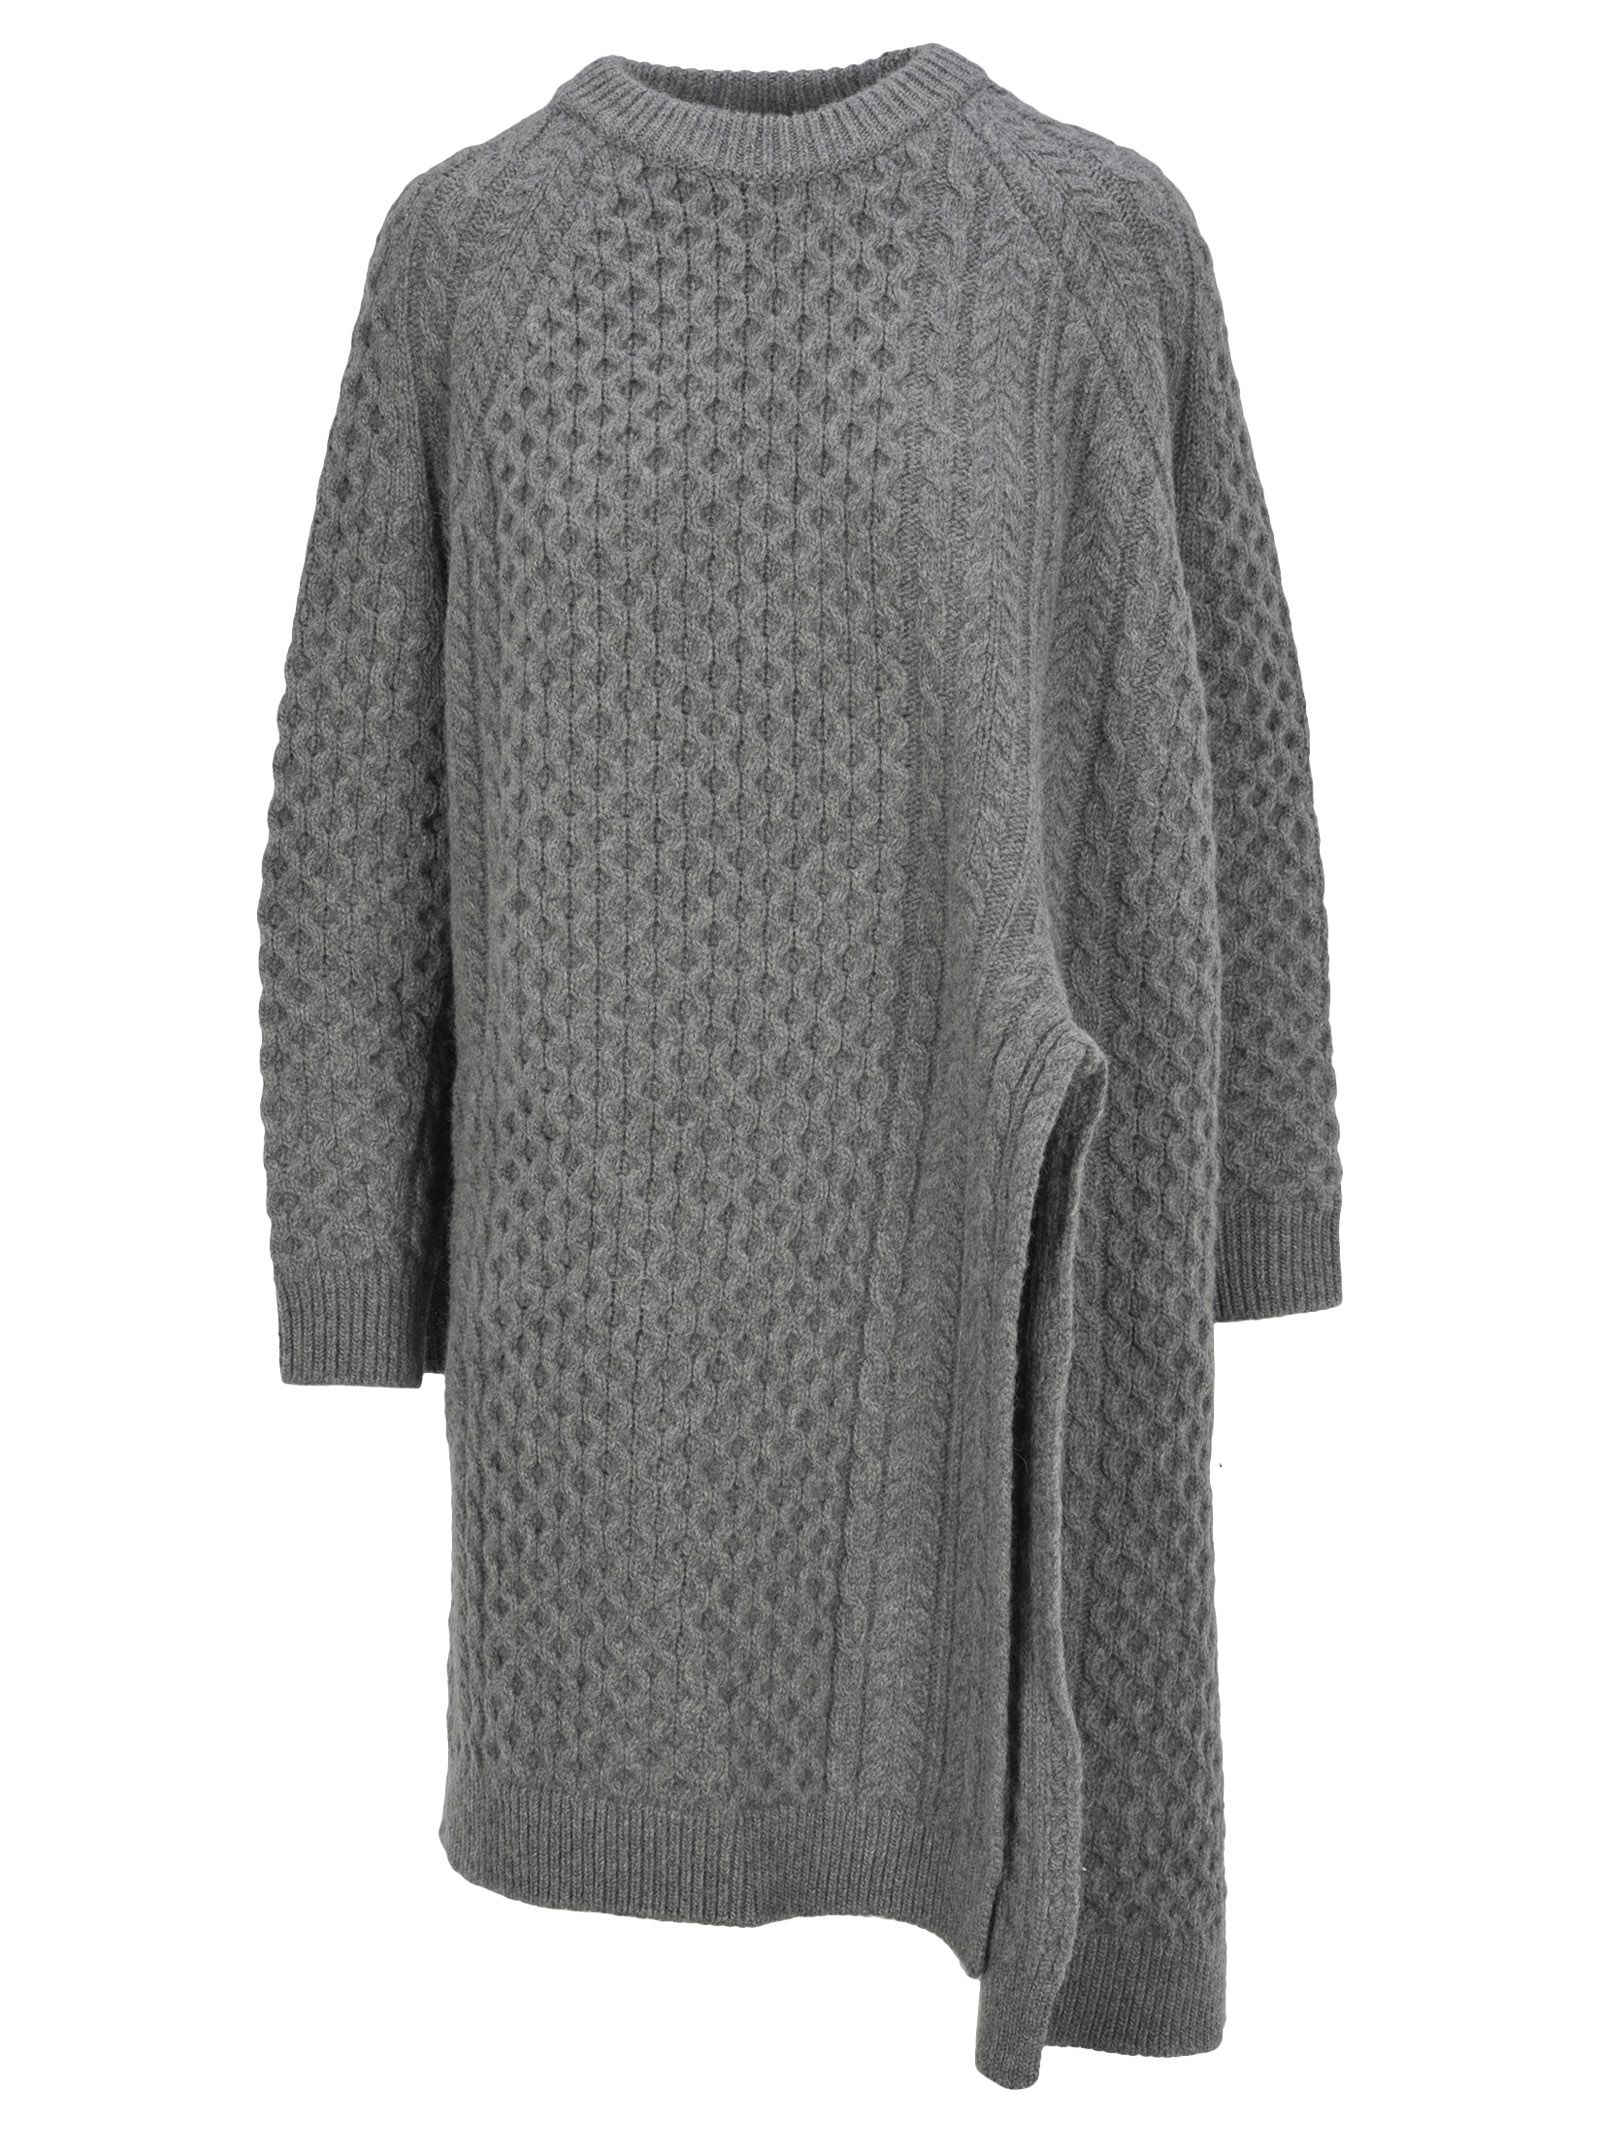 STELLA MCCARTNEY DRESS #17